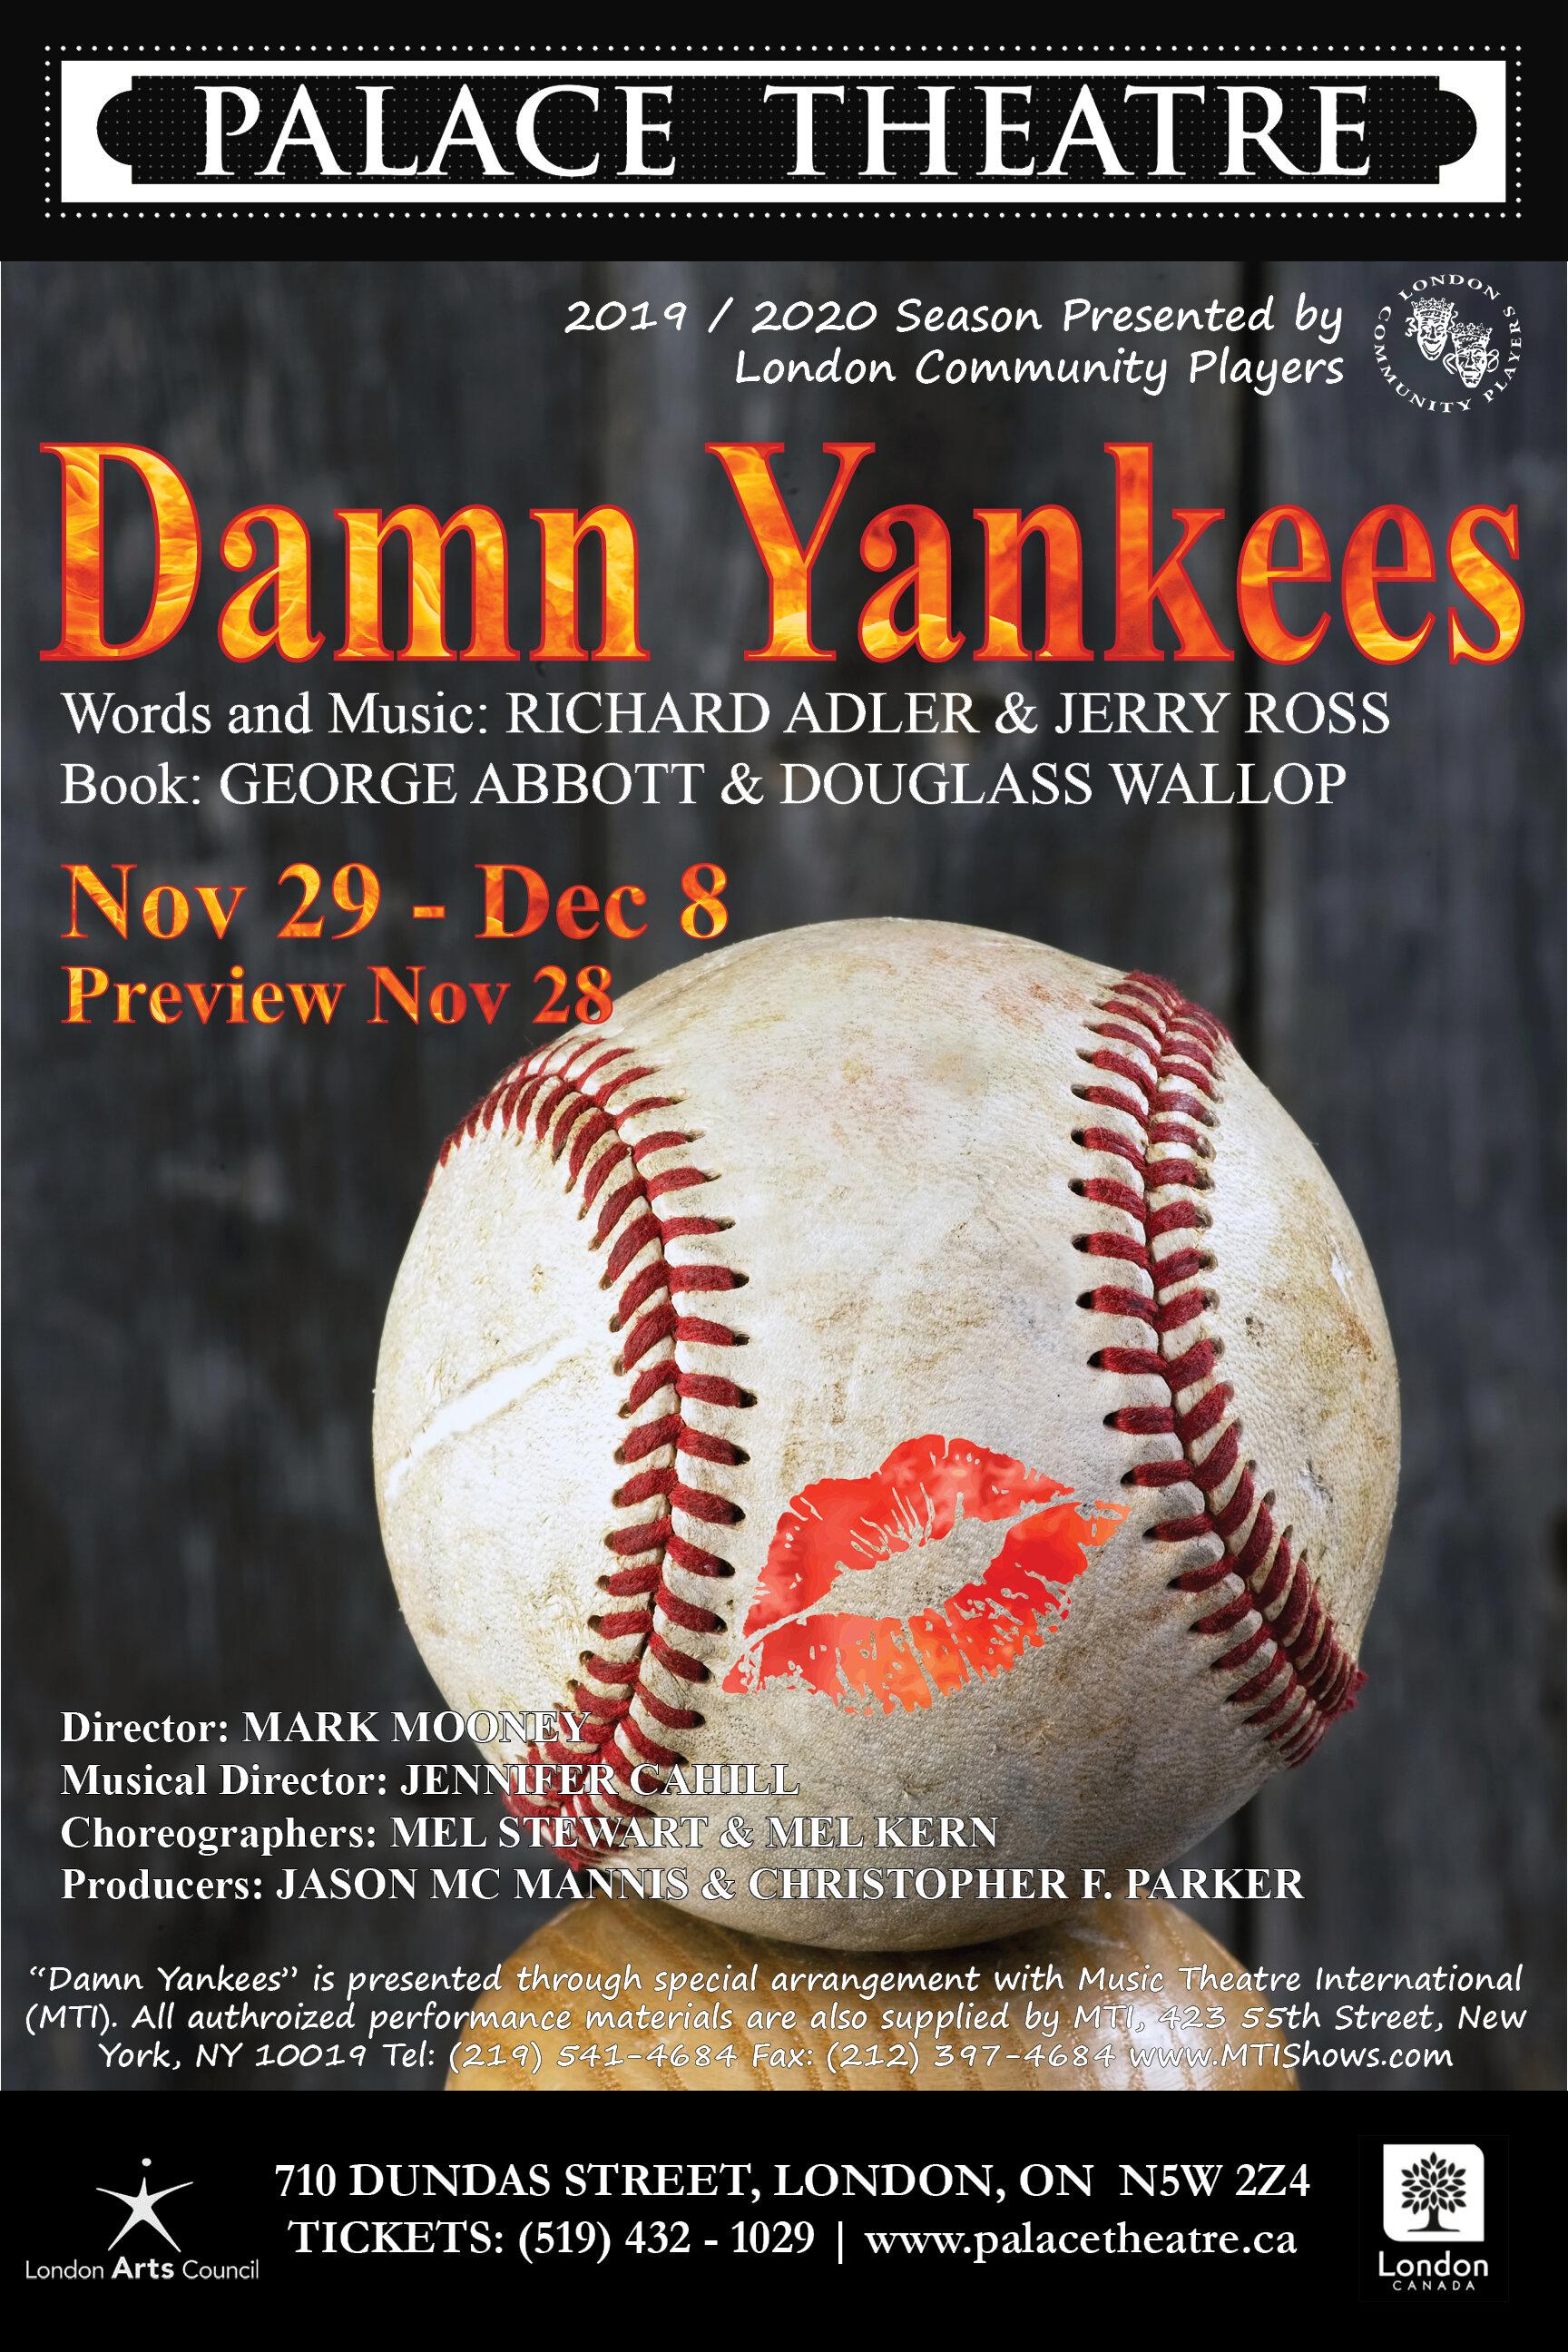 Damn Yankees Poster.jpg